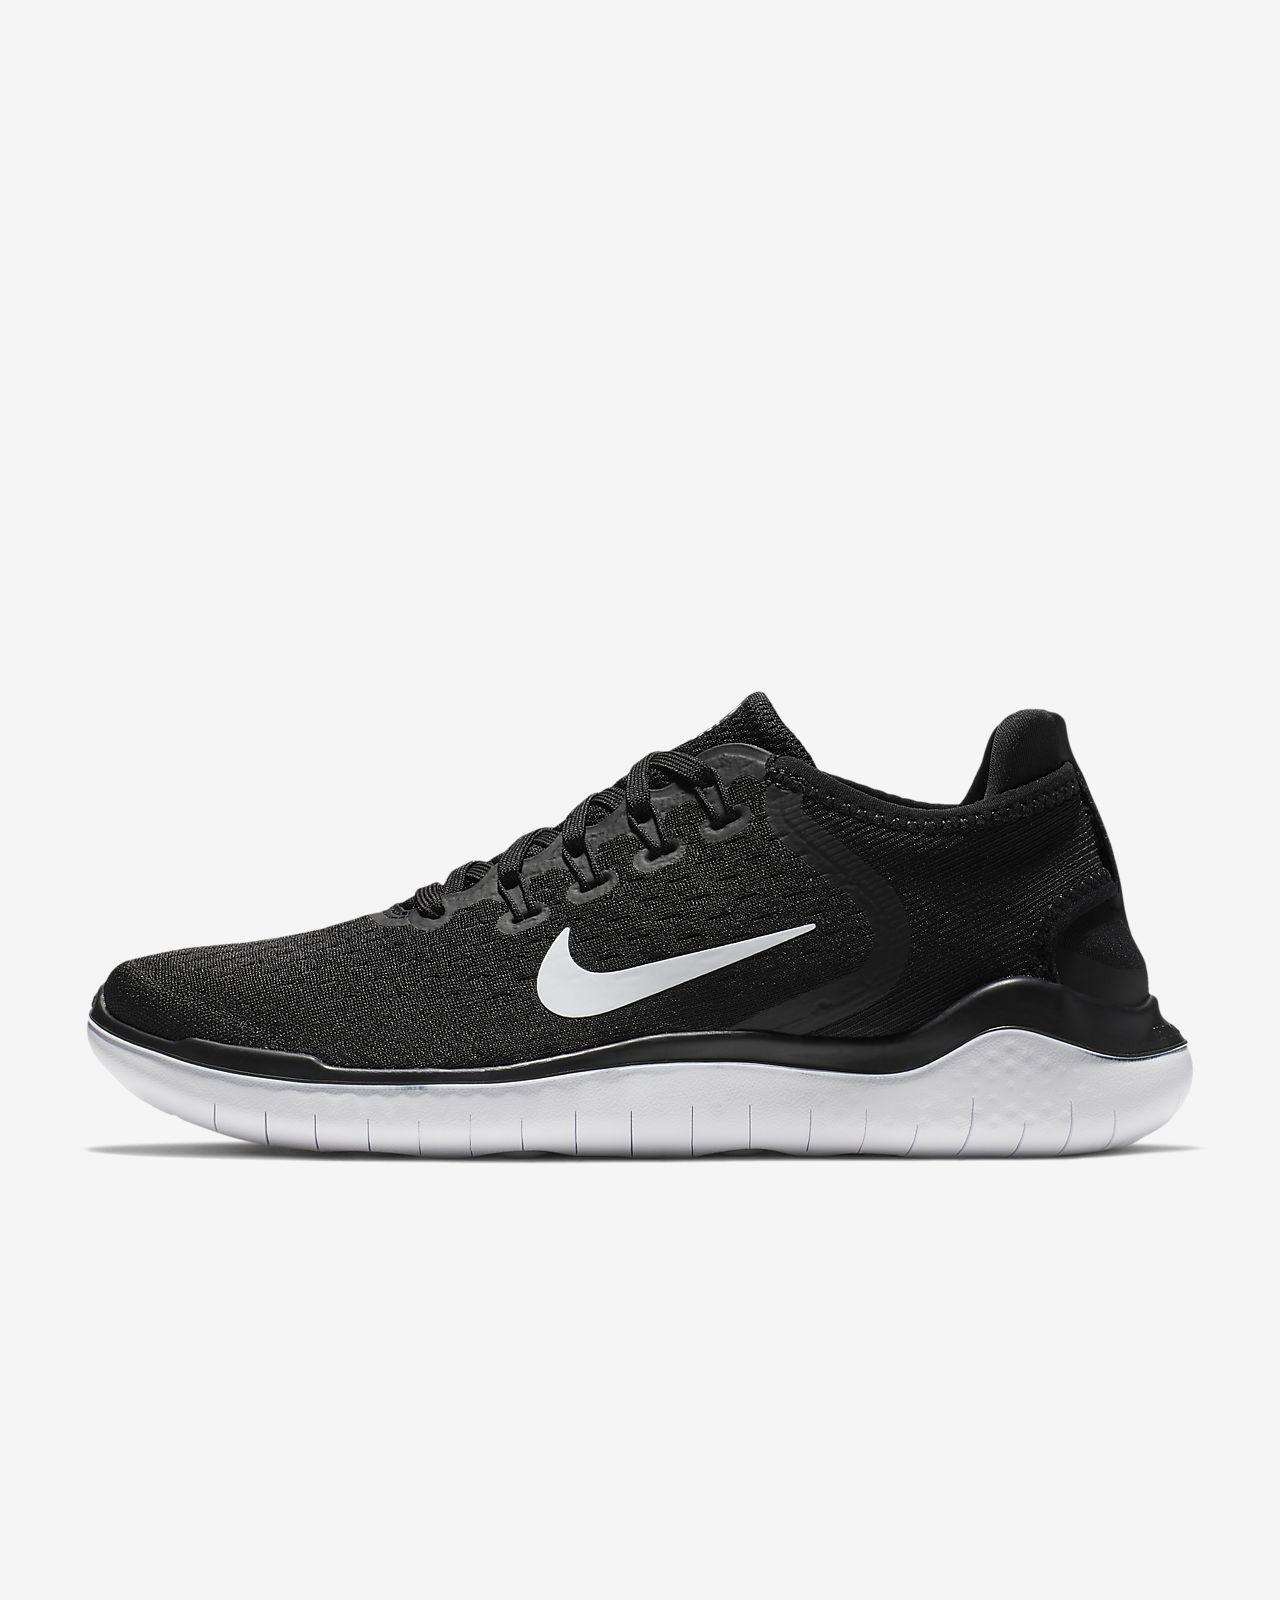 Nike Free RN 2018 Hardloopschoen voor dames